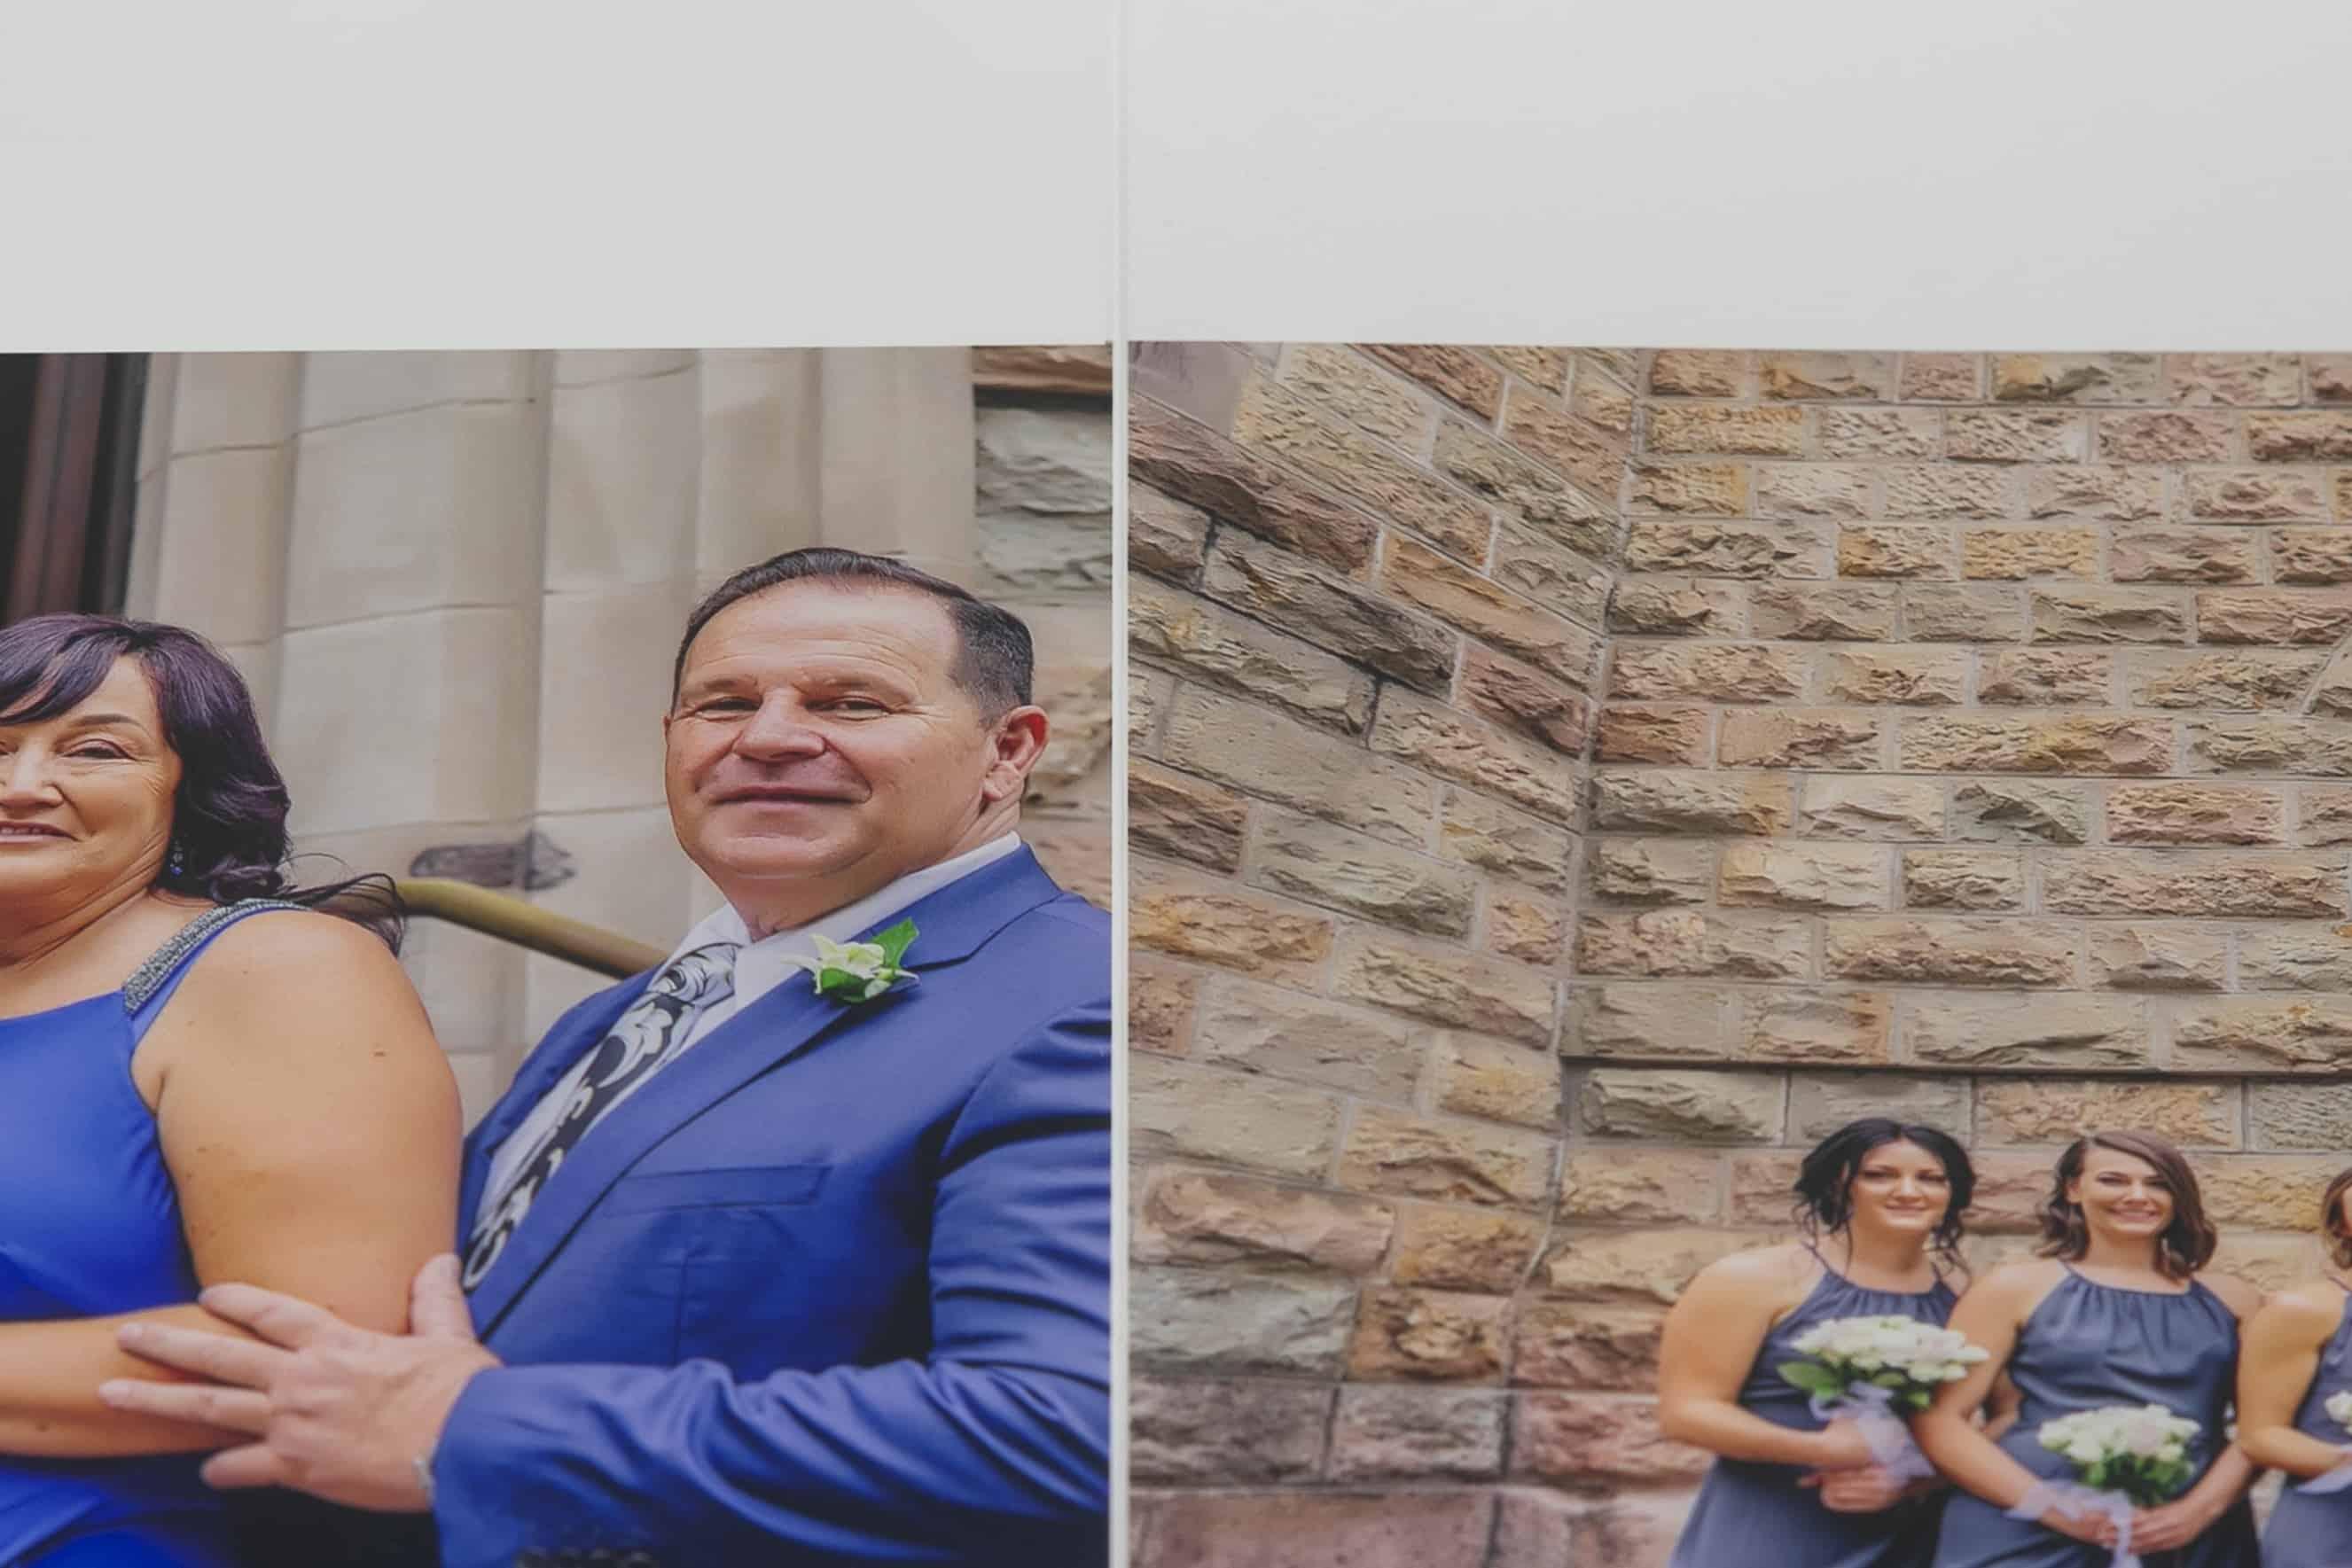 Professional Wedding Po Albums | Flush Mount Albums Photographic Wedding Portrait Albums By Bpro